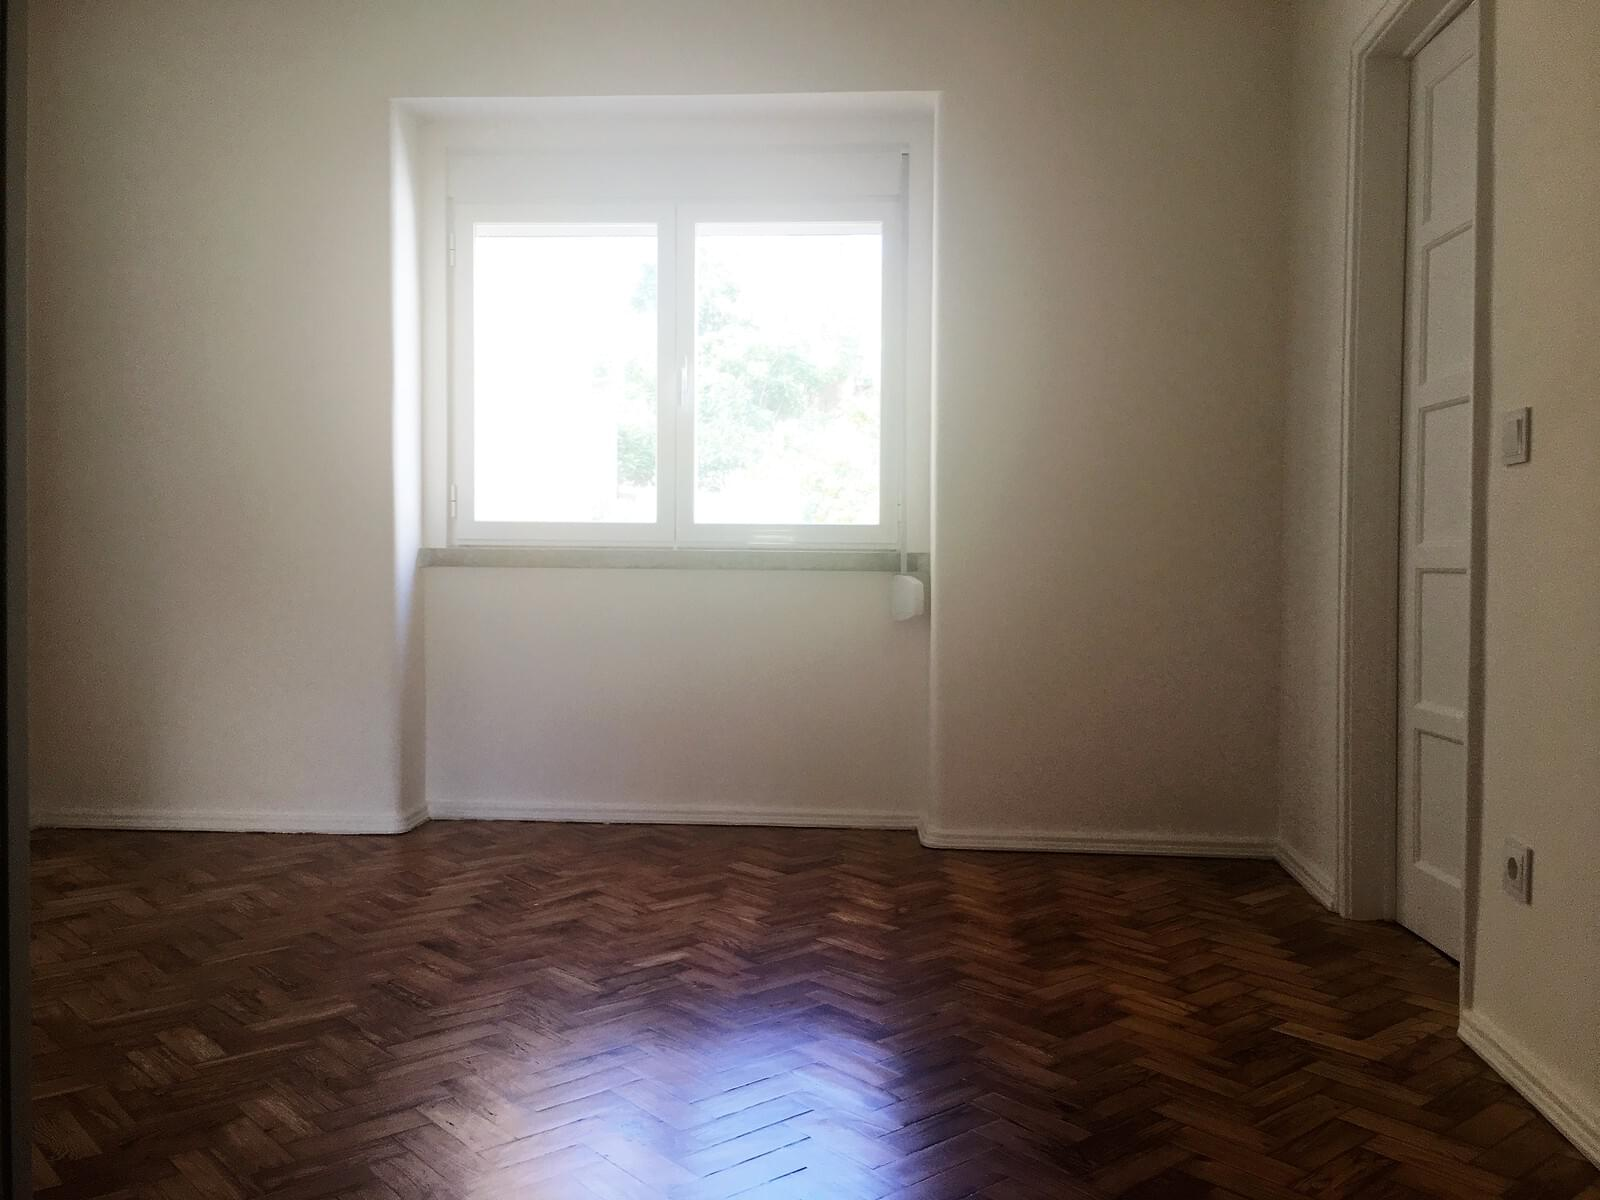 pf17642-apartamento-t3-lisboa-5899ea80-632a-4c13-8d4f-1913e1aa8a44